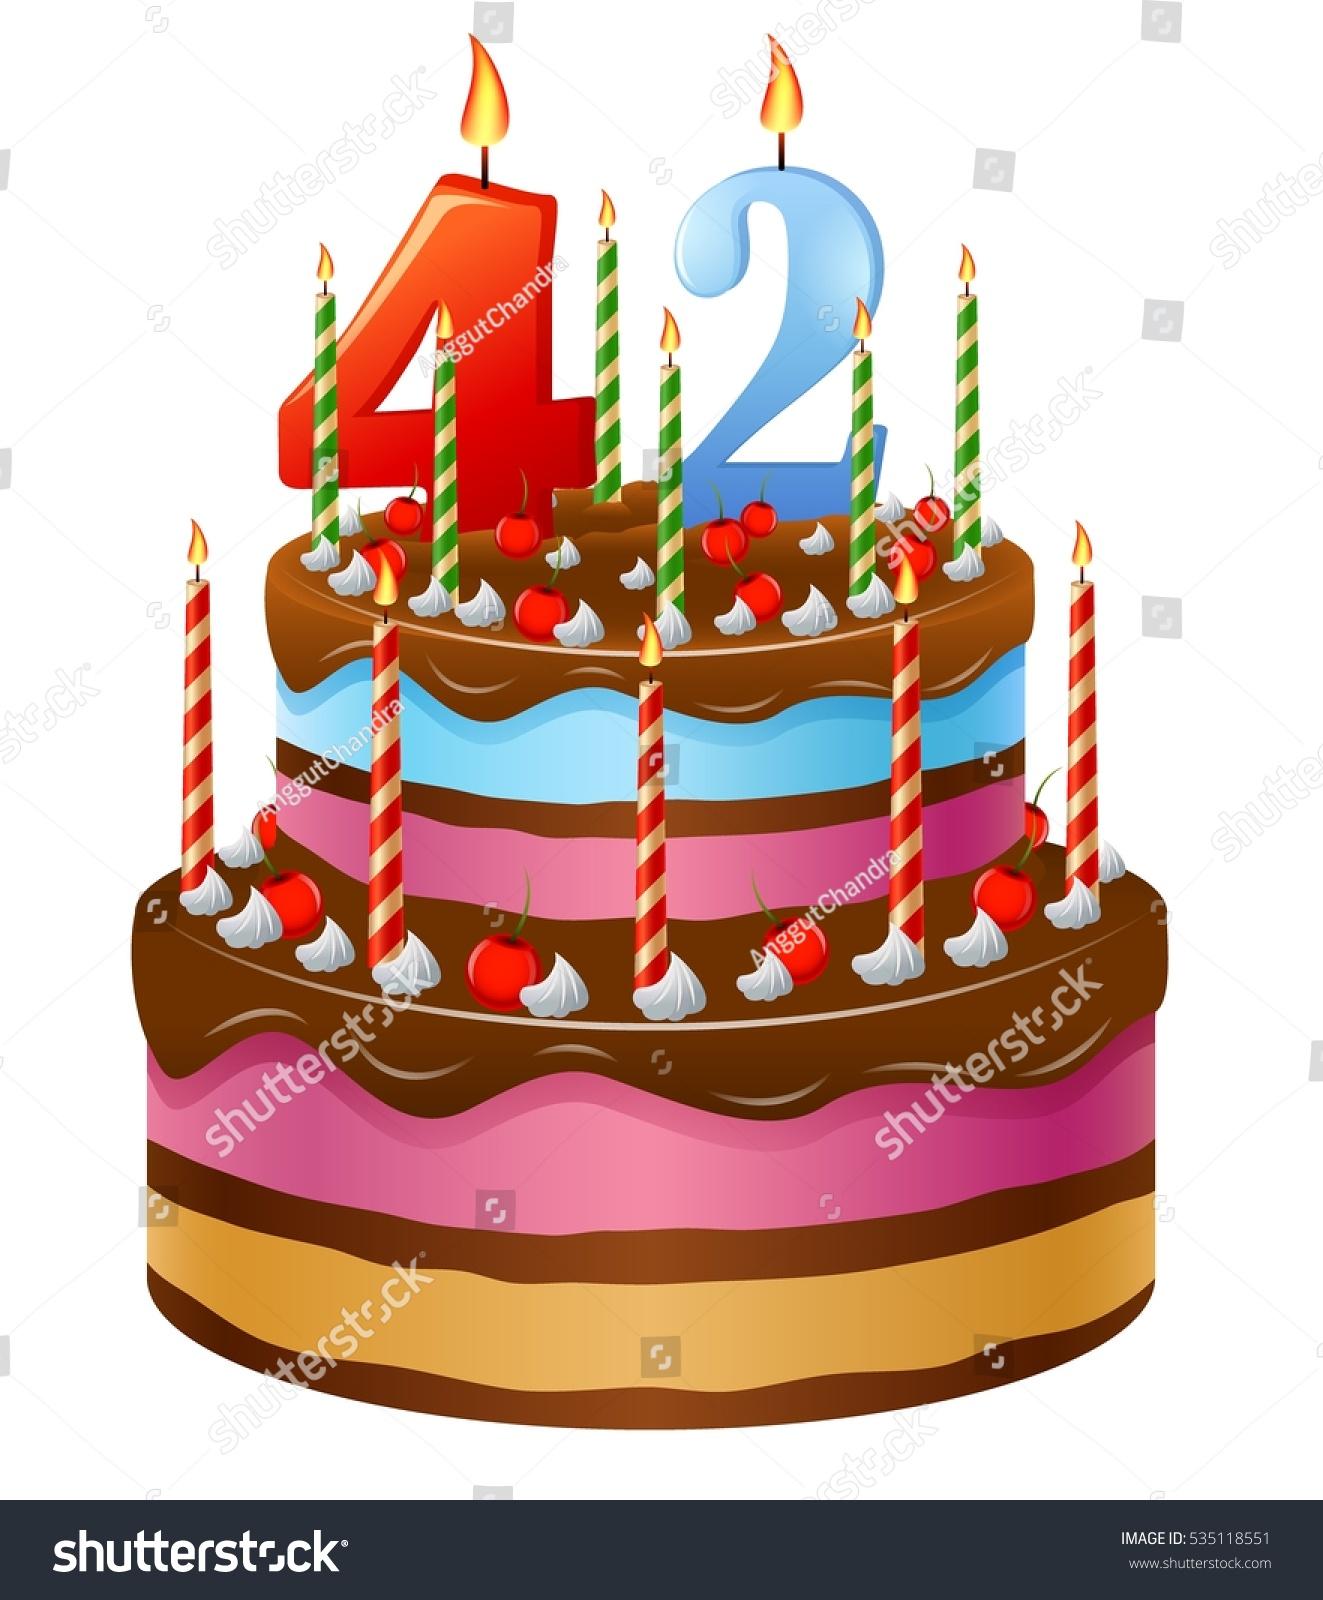 Peachy Happy Birthday Cake 42 Stock Vector Royalty Free 535118551 Funny Birthday Cards Online Fluifree Goldxyz